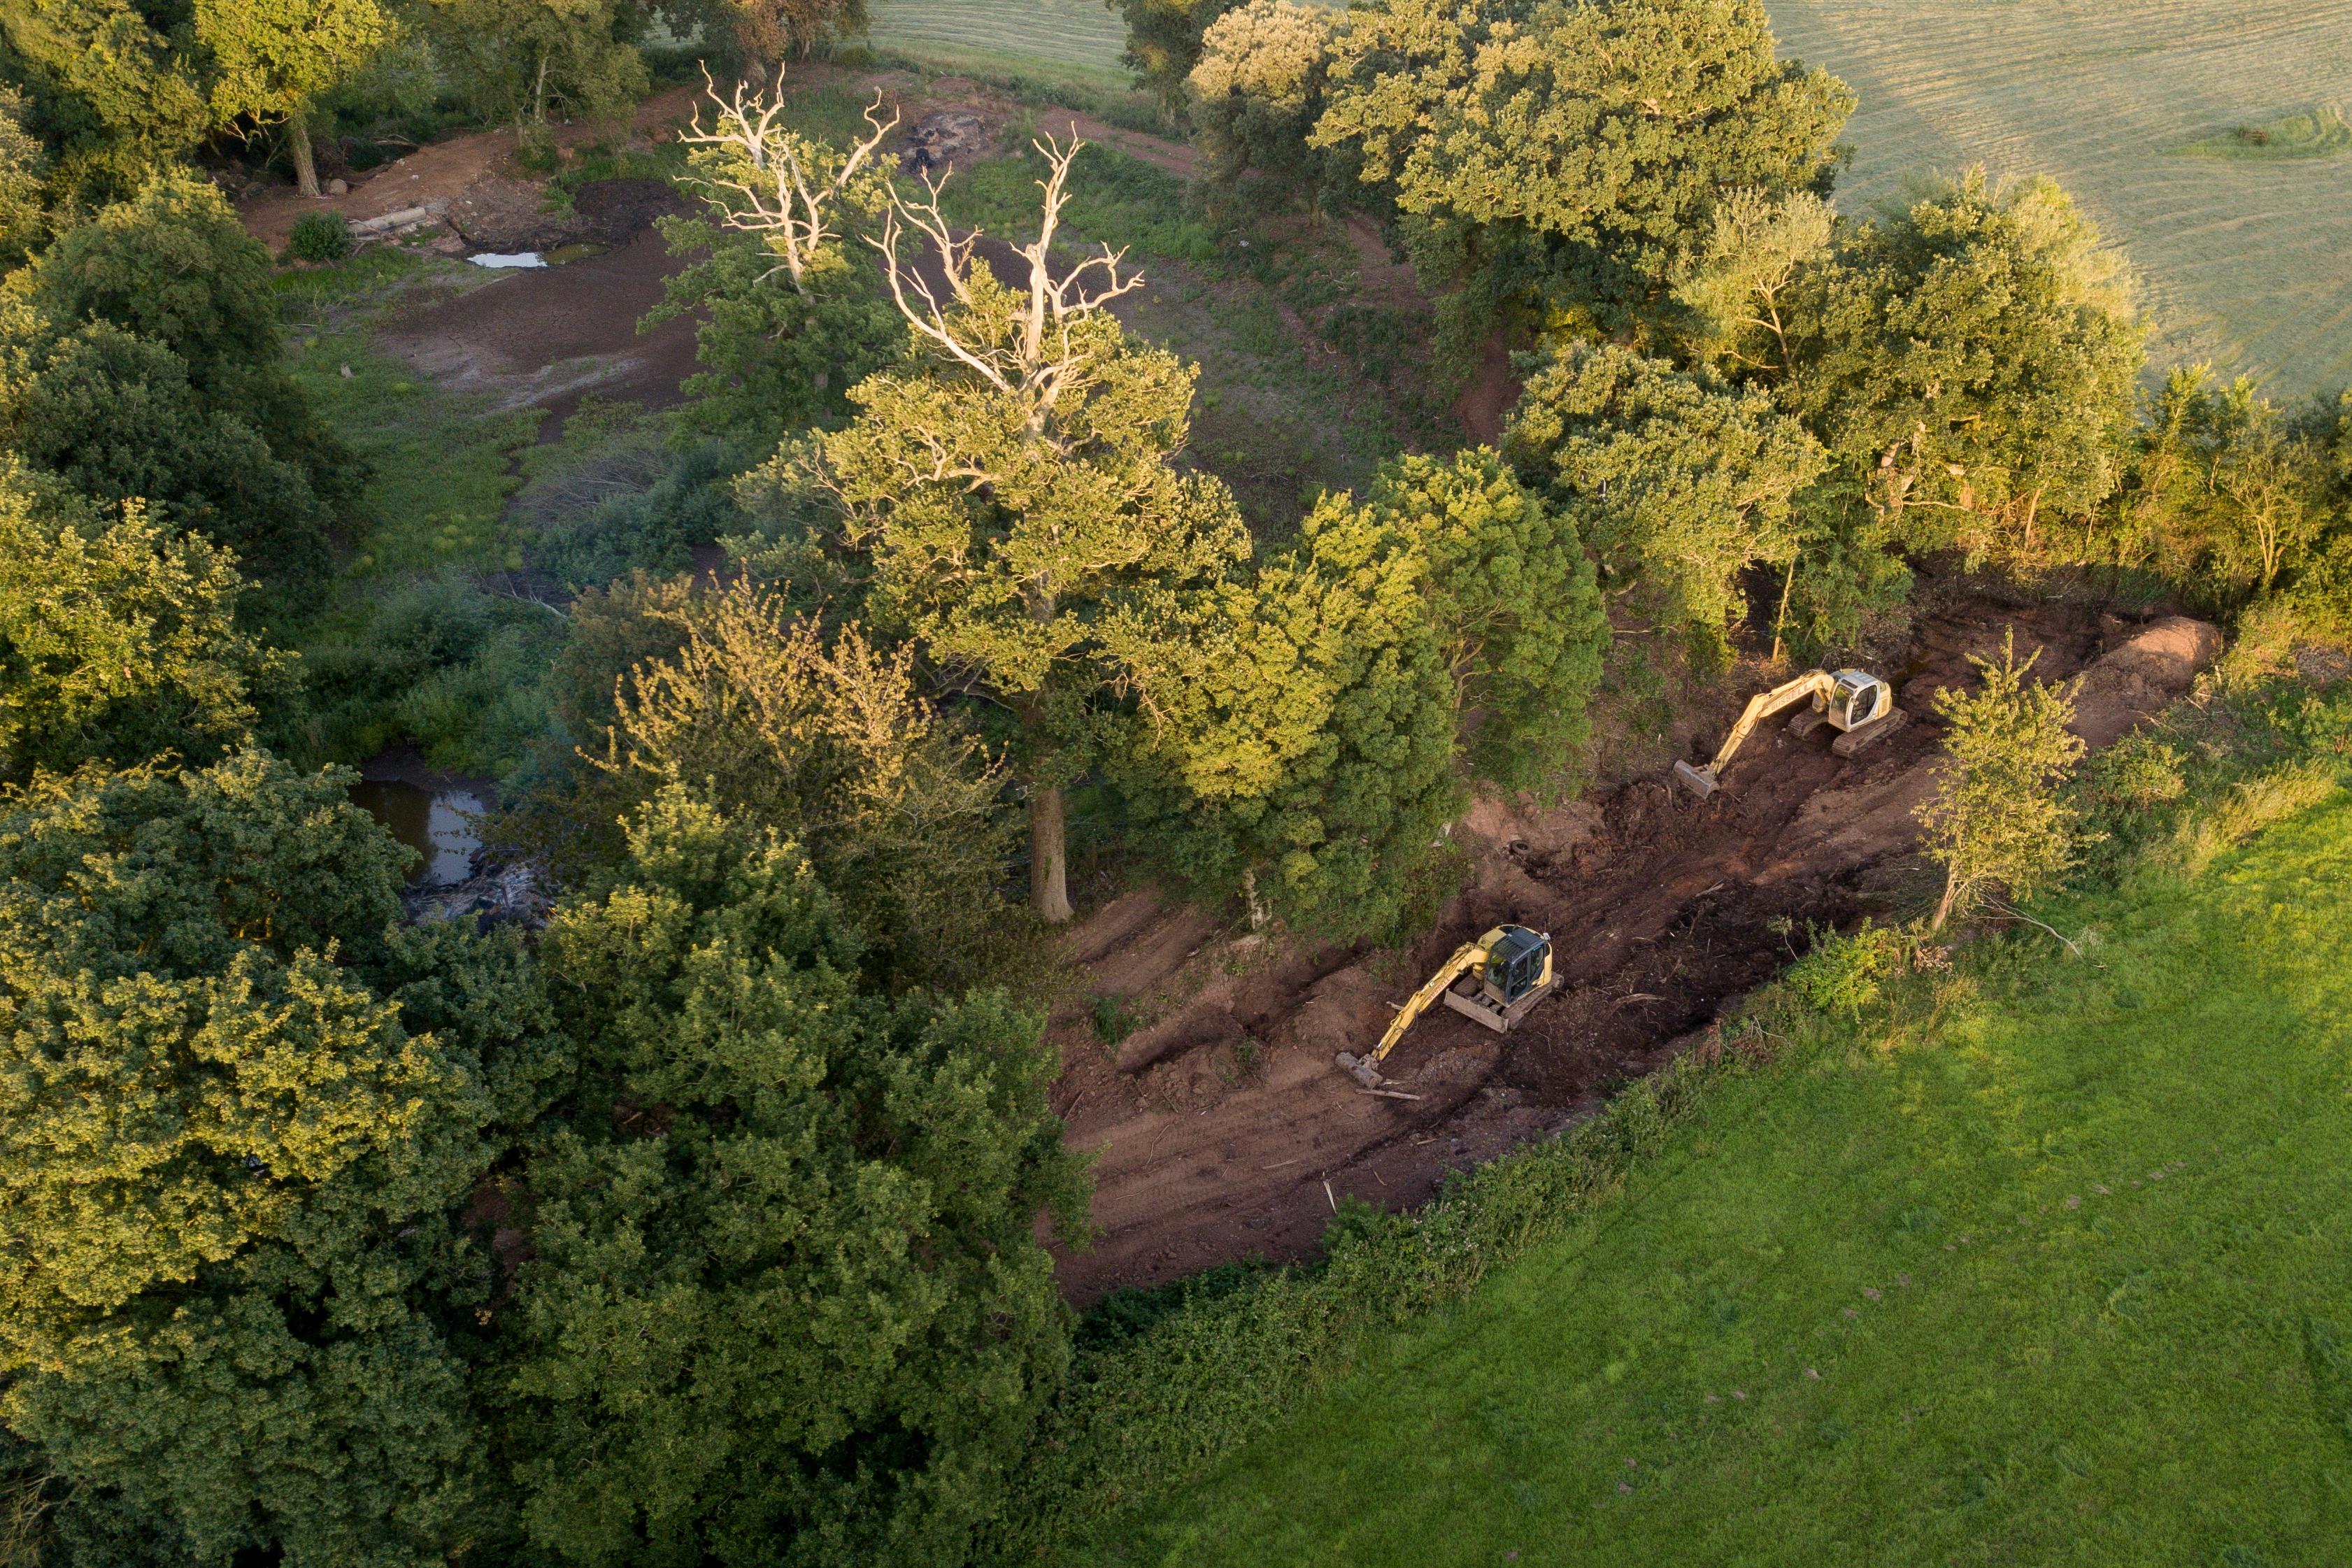 Restoration work taking place on the Water Garden. Photo: Pawel Porowski